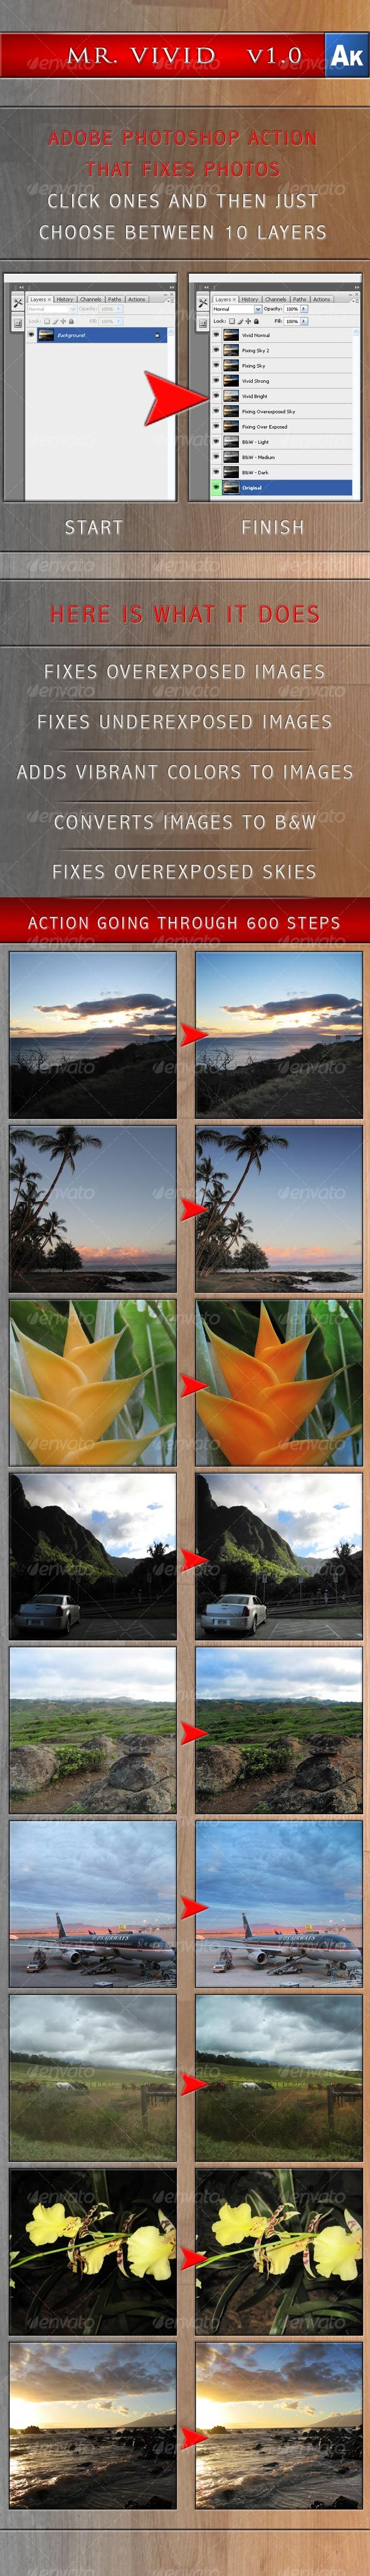 GraphicRiver Mr Vivid v1.0 for Adobe Photoshop 101044